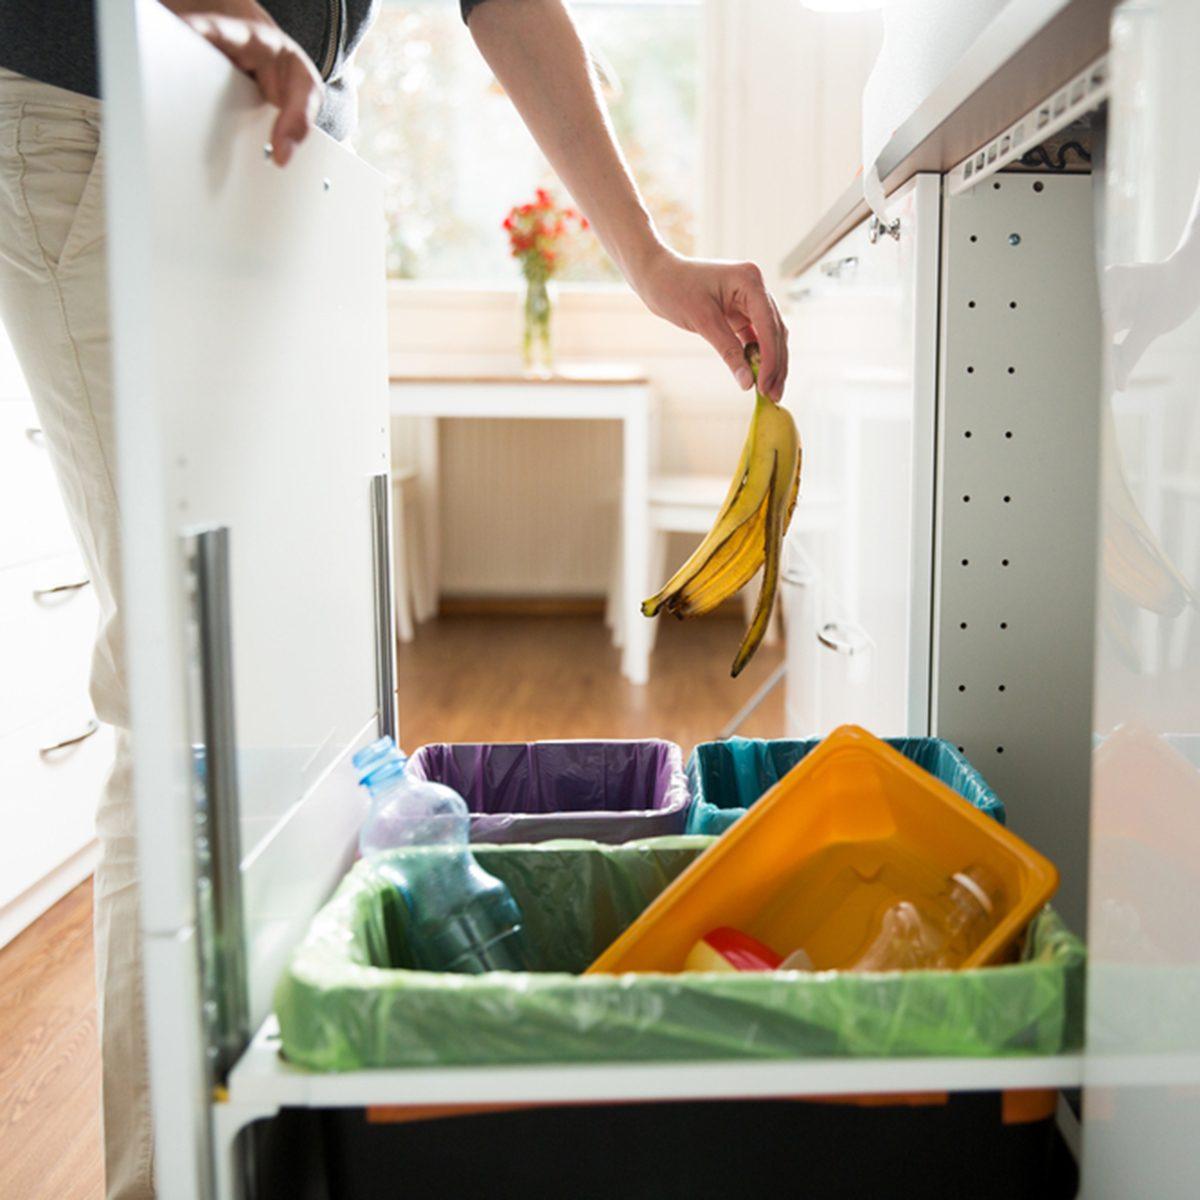 Woman putting banana peel in recycling bio bin in the kitchen.